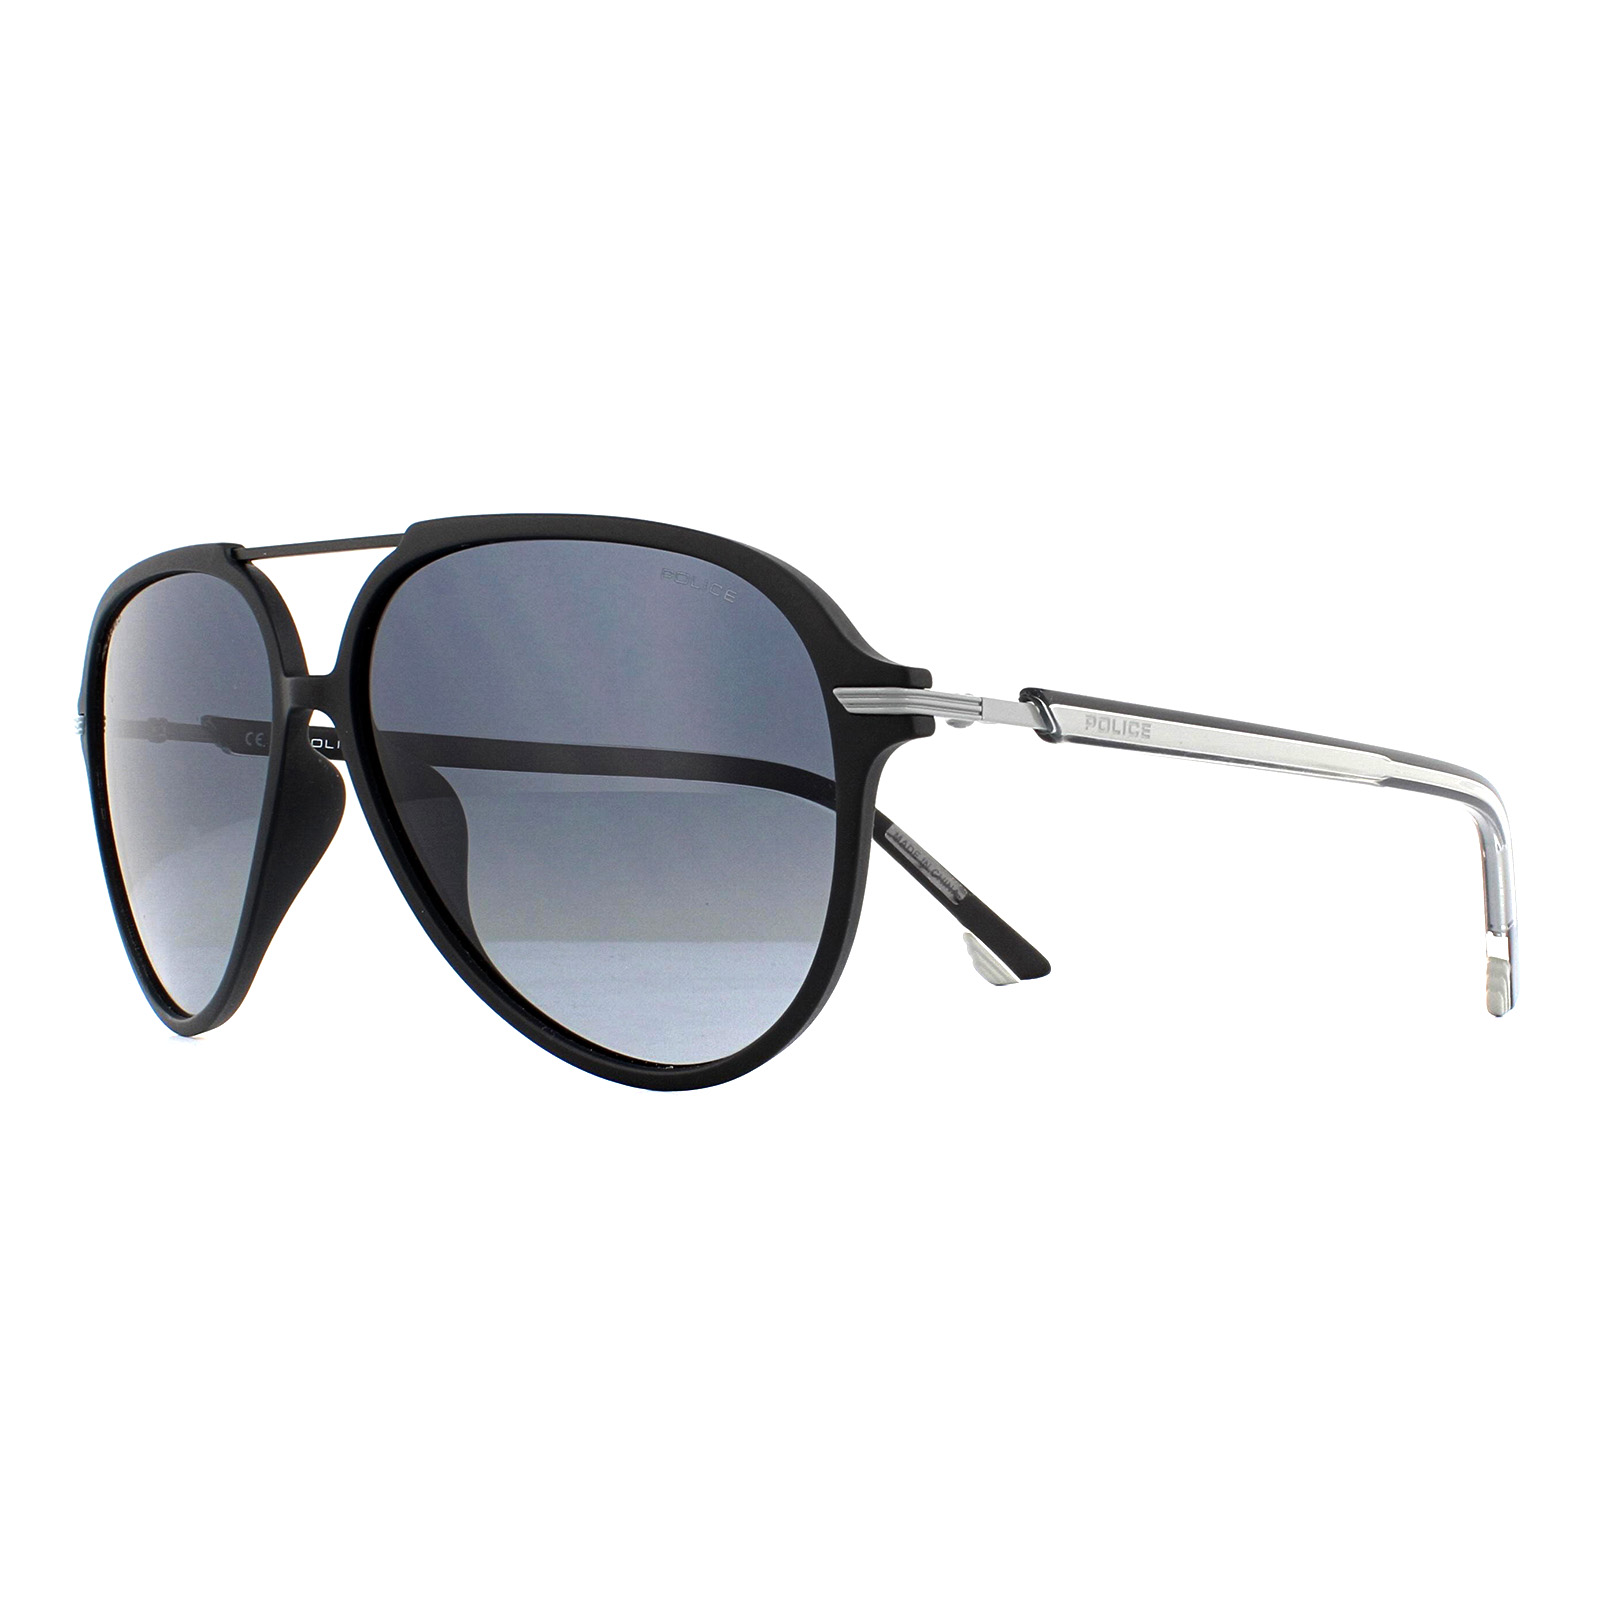 Blue Grey Gradient polarised lenses SPL-582 U28Z Police sunglasses Drop 2 Matt Black Grey